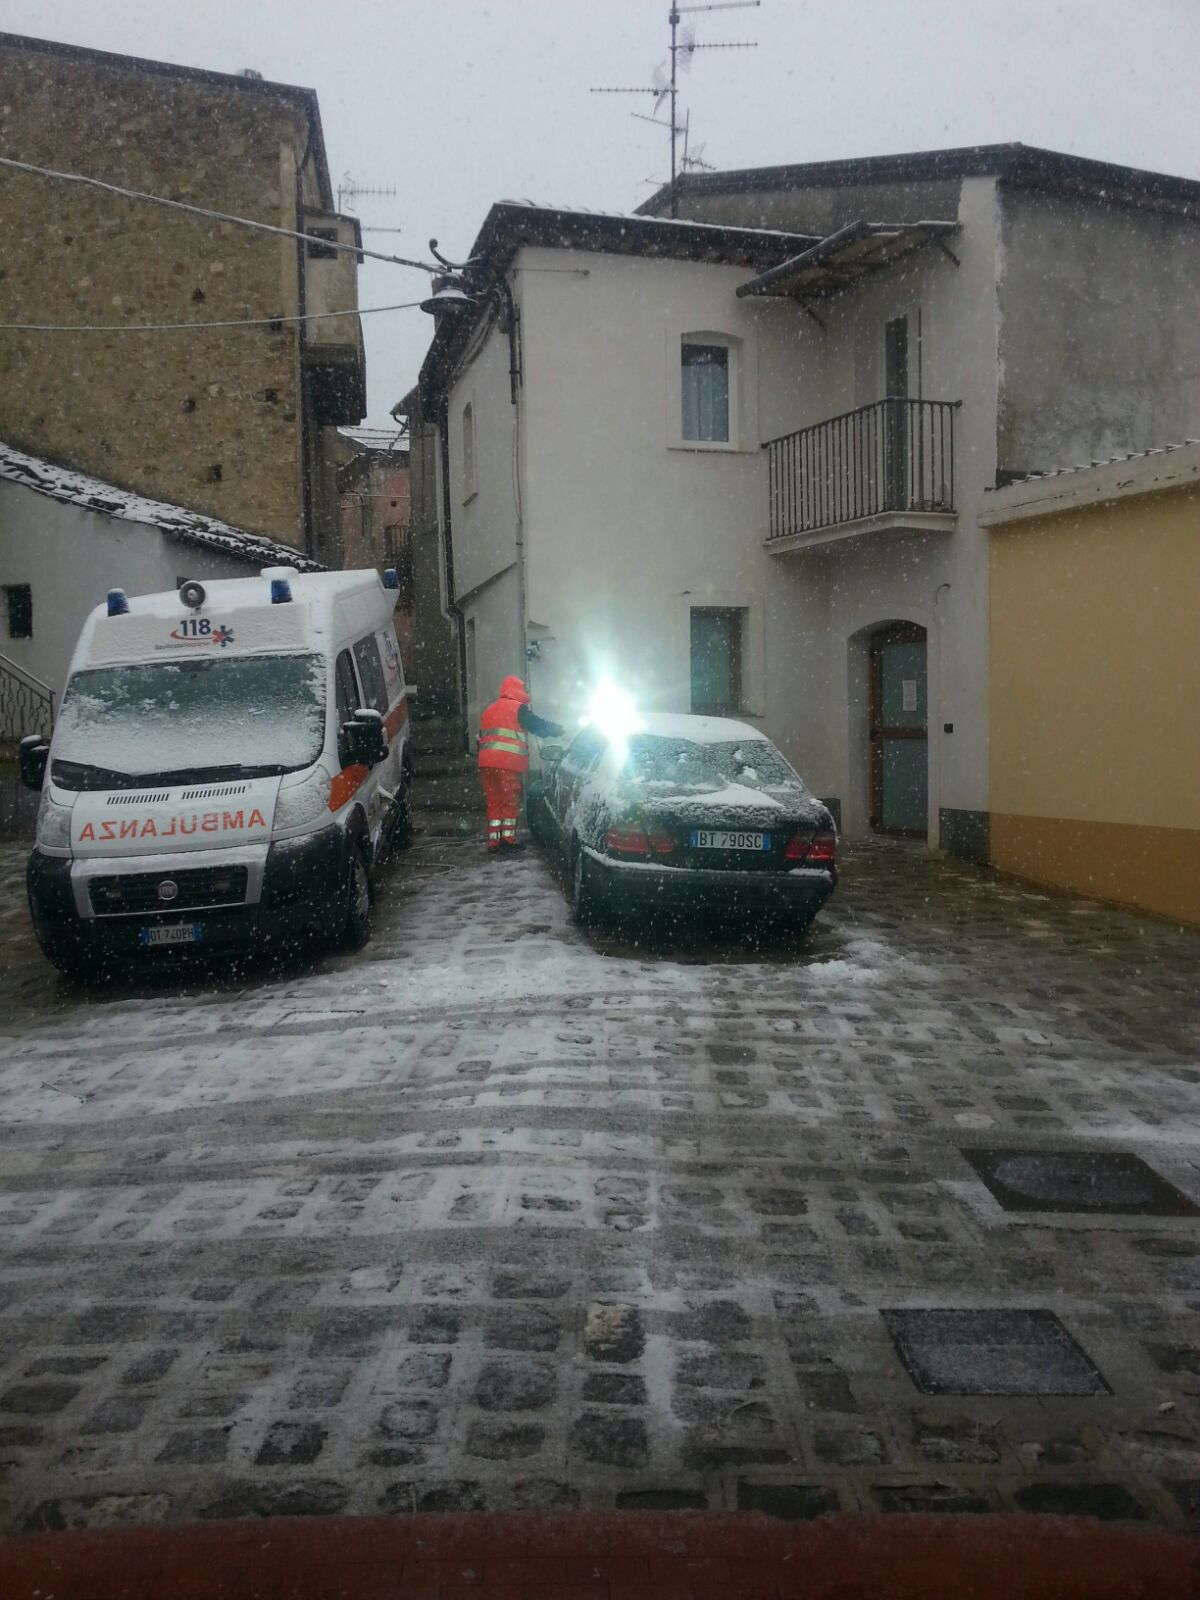 Nowcasting Calabria Gennaio 2017-img-20170105-wa0005.jpg